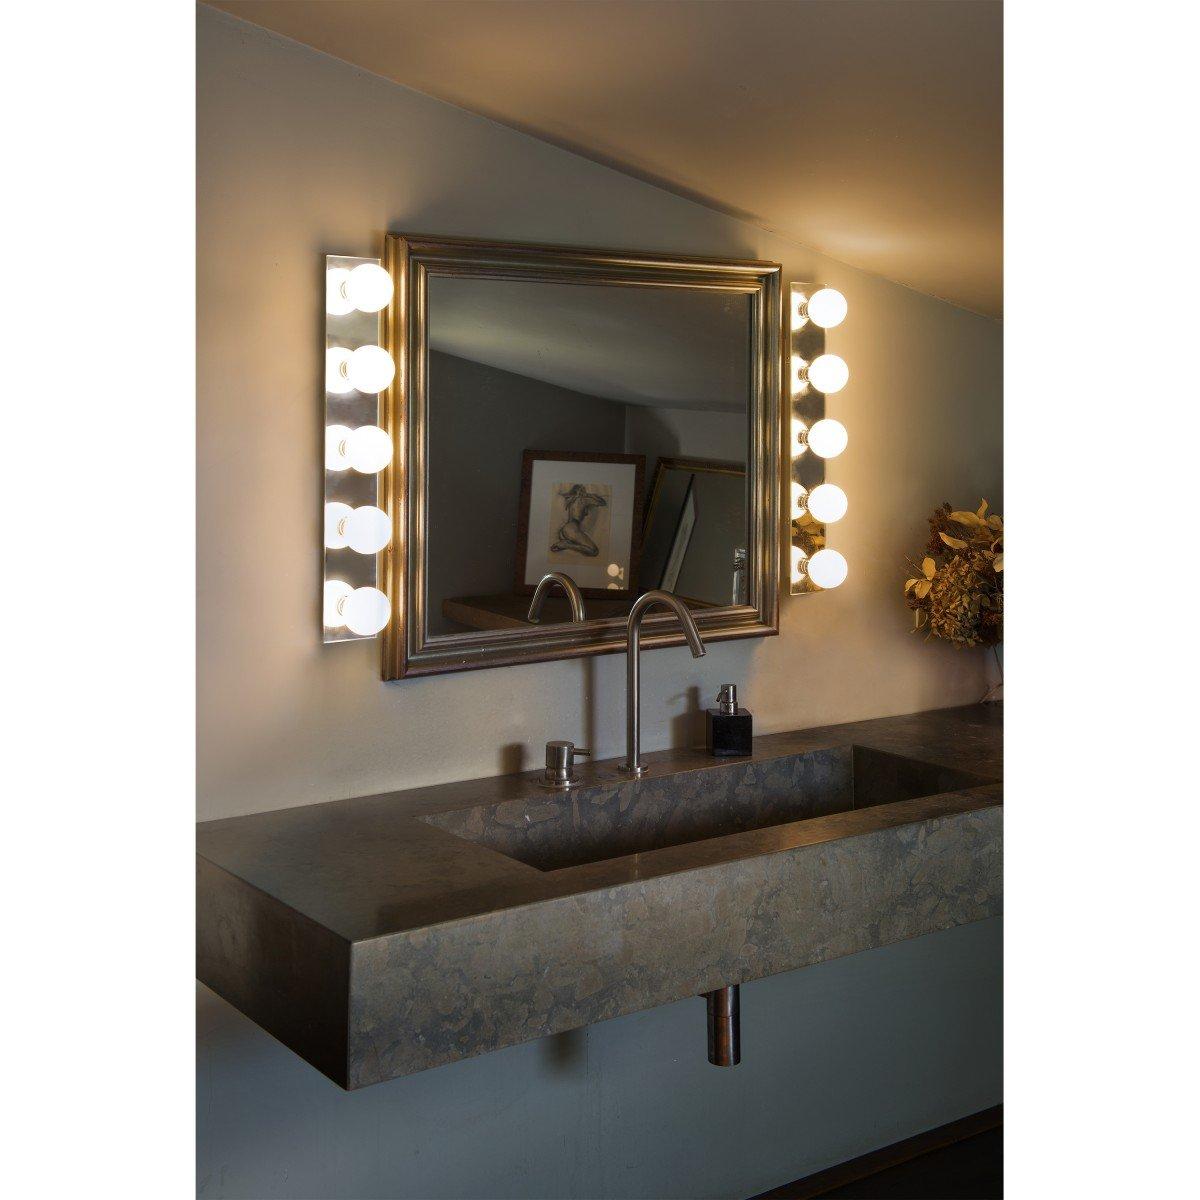 Faro lass l mpara aplique espejo 63009 faro iluminaci n - Aplique pared bano ...